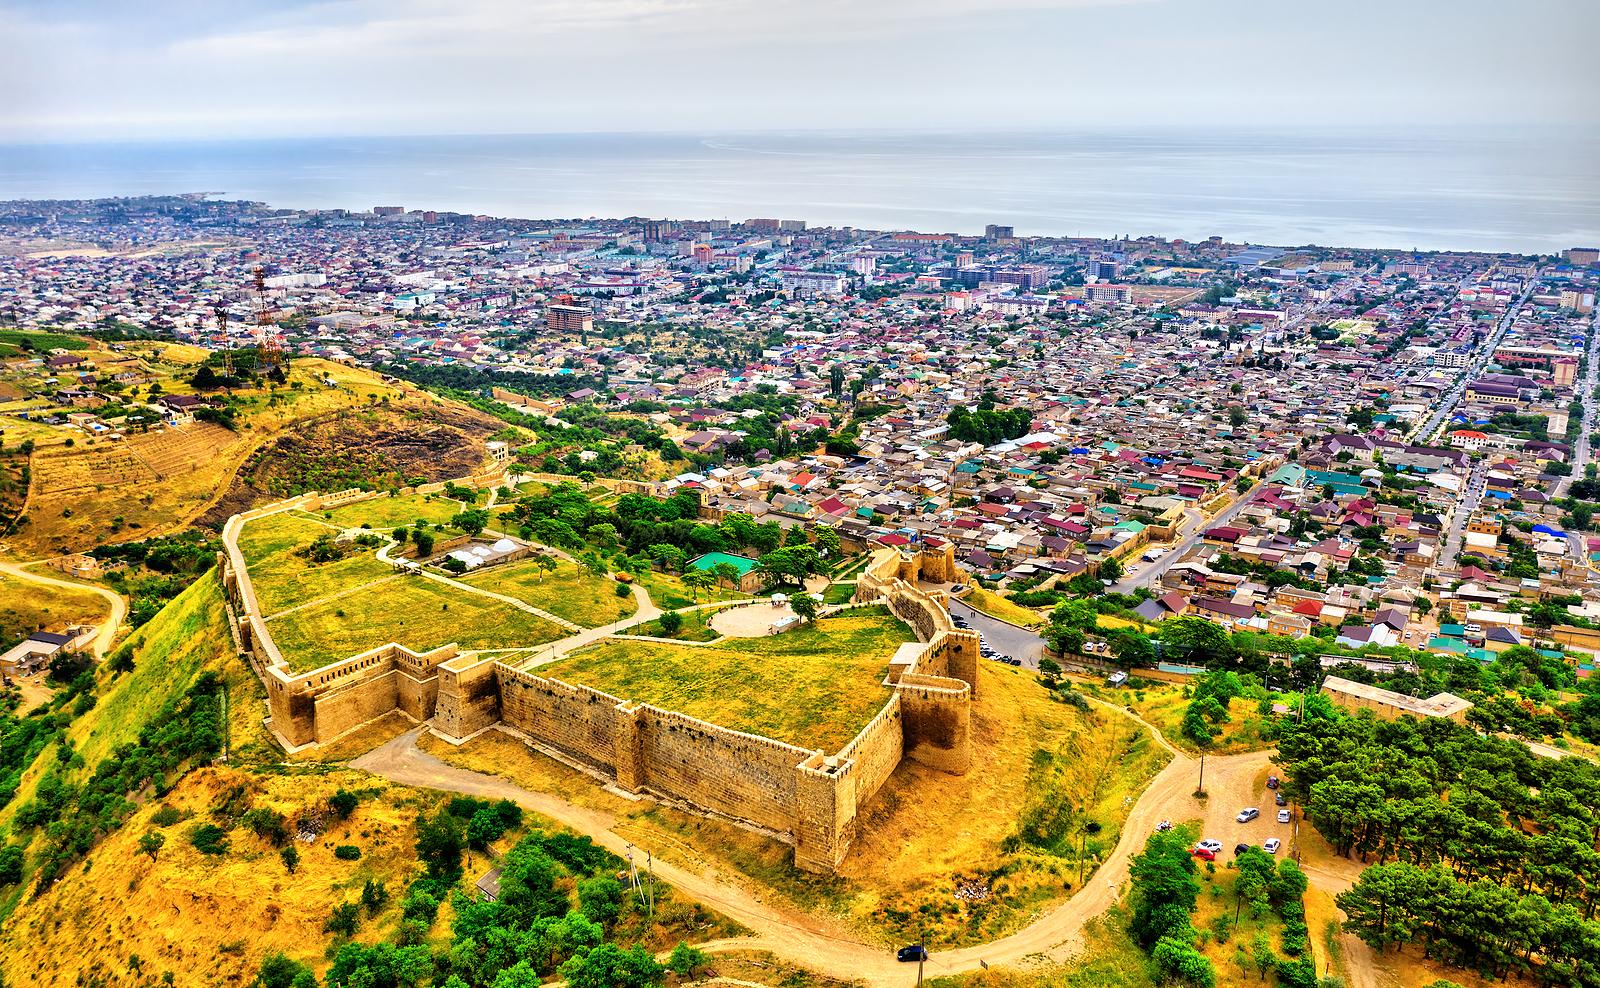 The Naryn-Kala fortress in Derbent